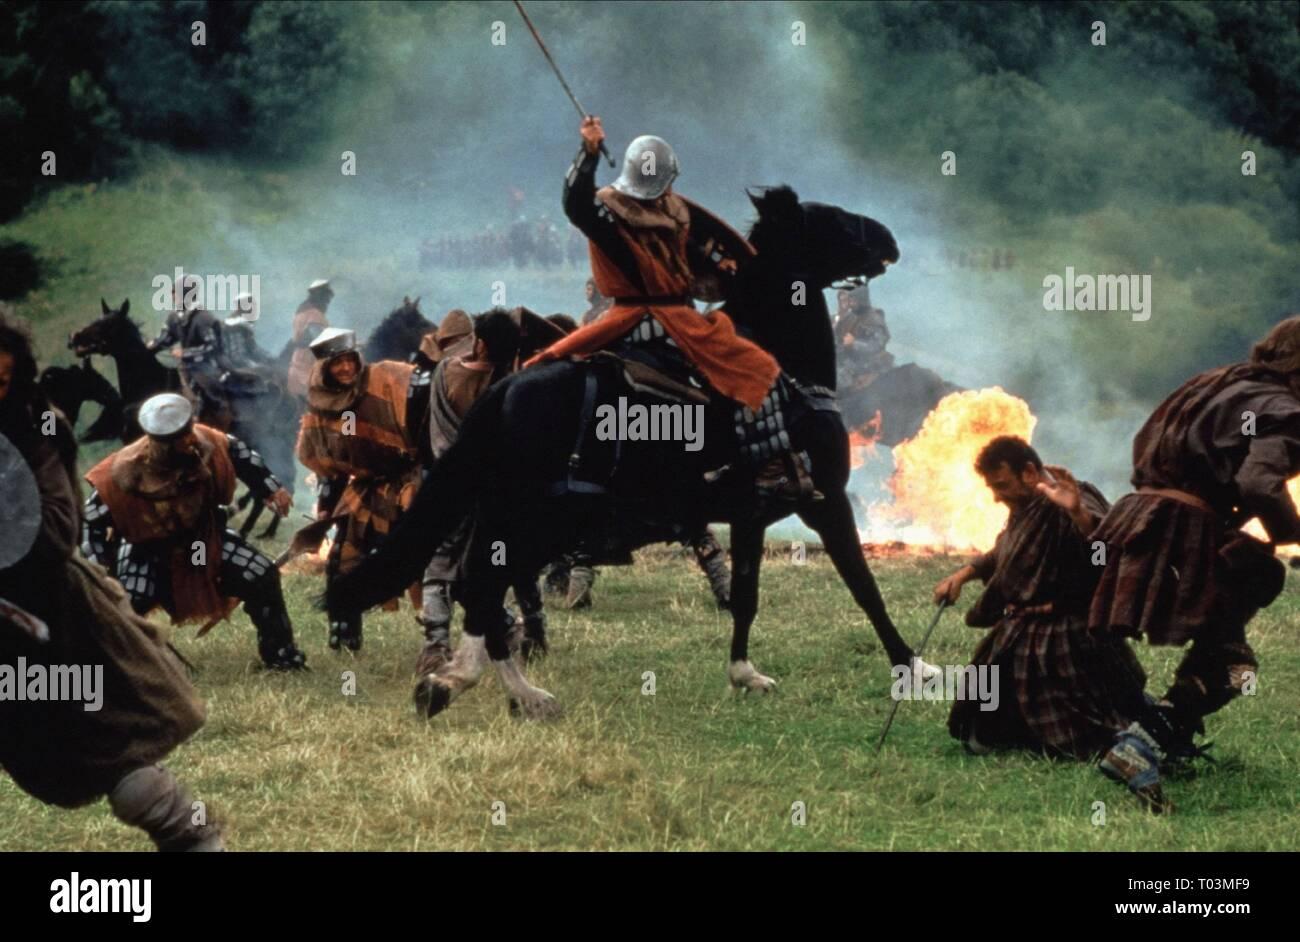 BATTLE SCENE, BRAVEHEART, 1995 - Stock Image